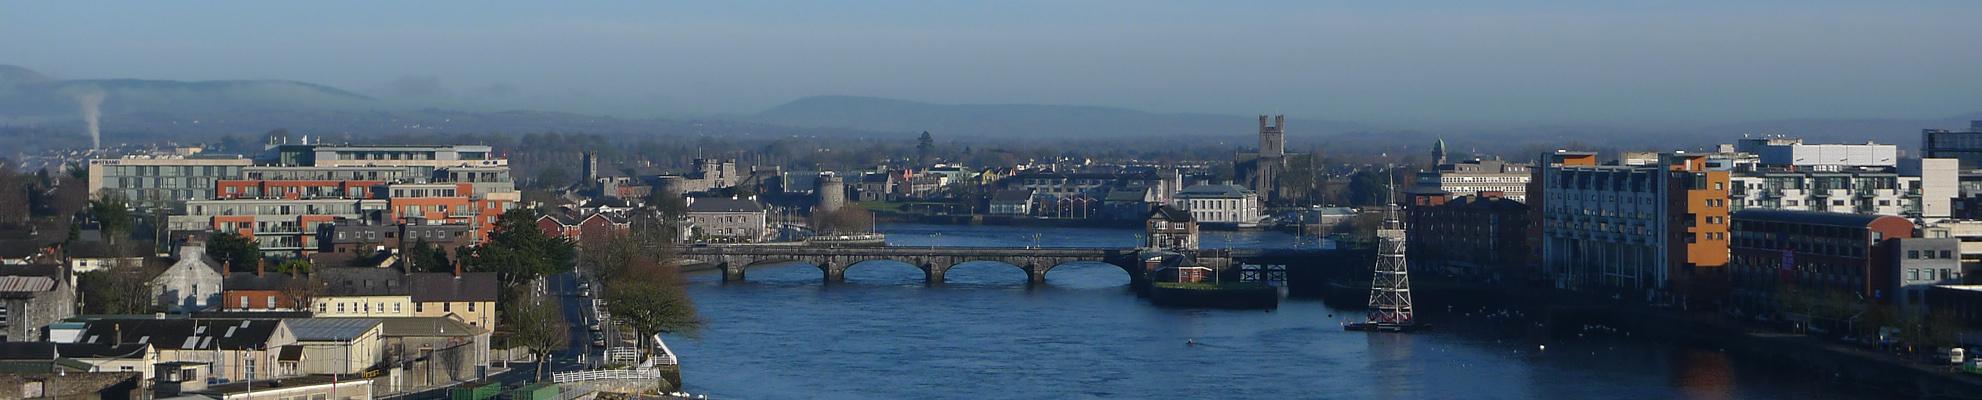 Limerick Pano